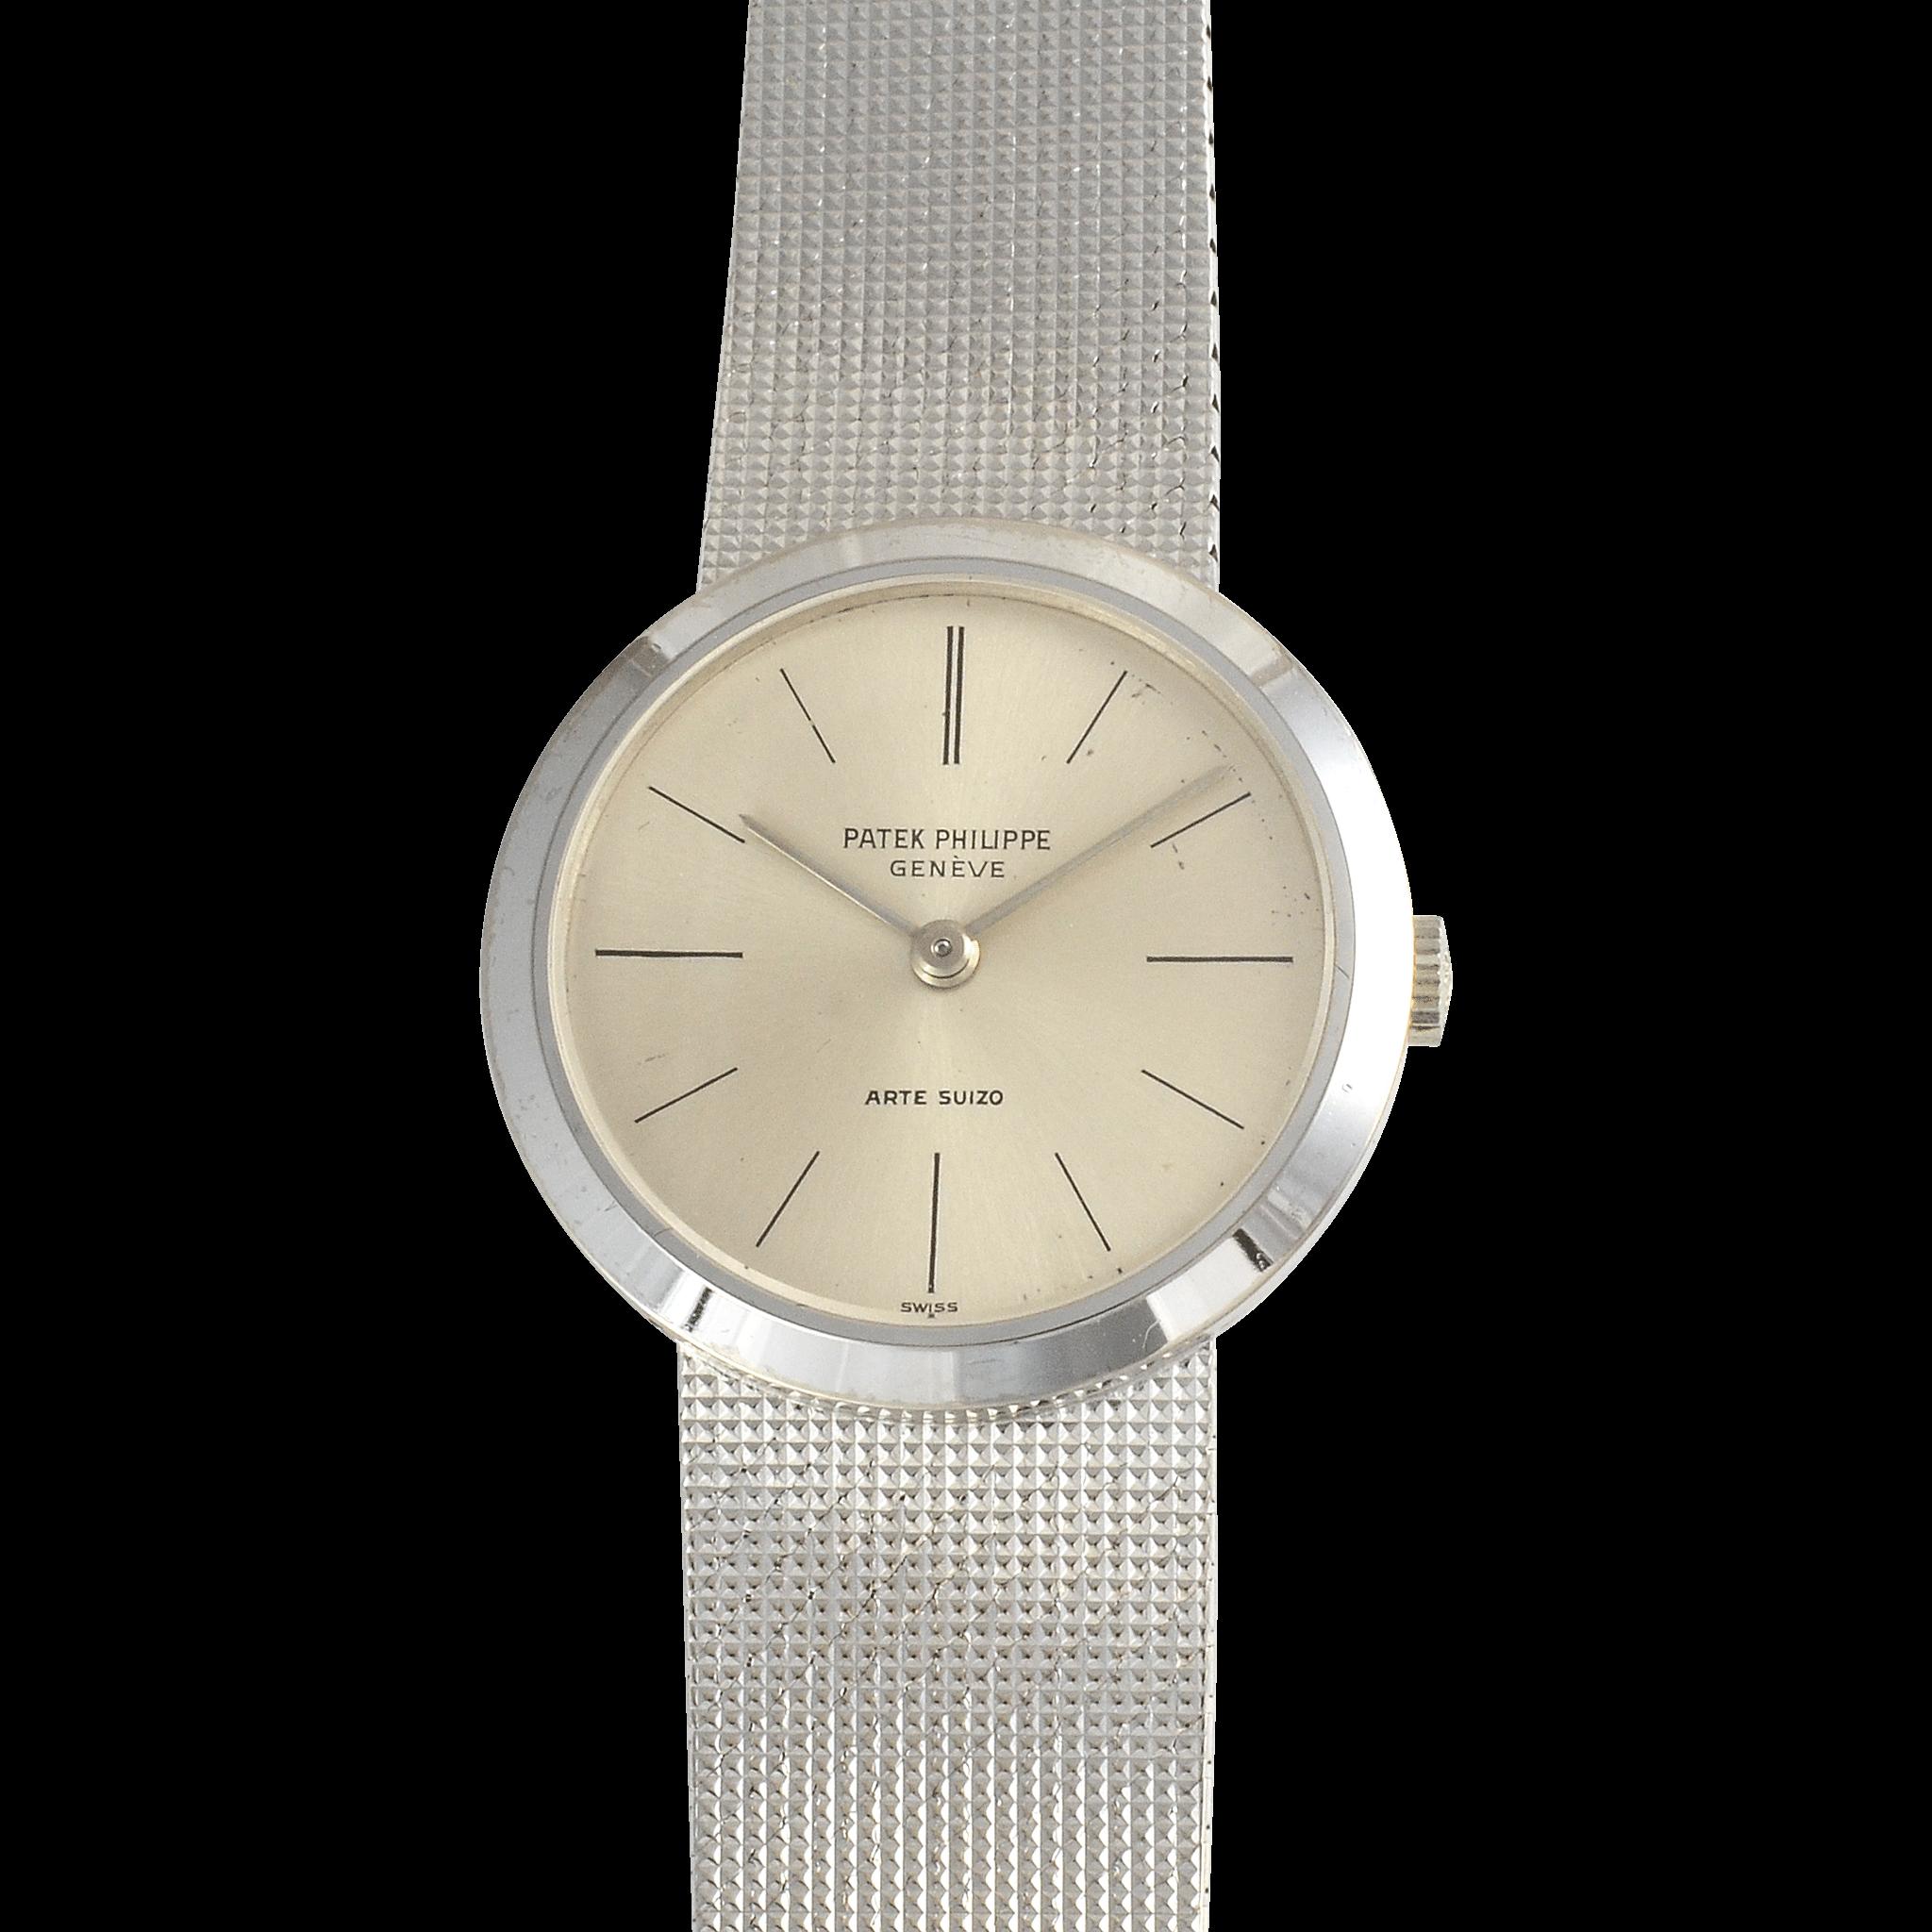 Swiss Ladies 18K Gold Calatrava Wrist Watch by Patek Philippe